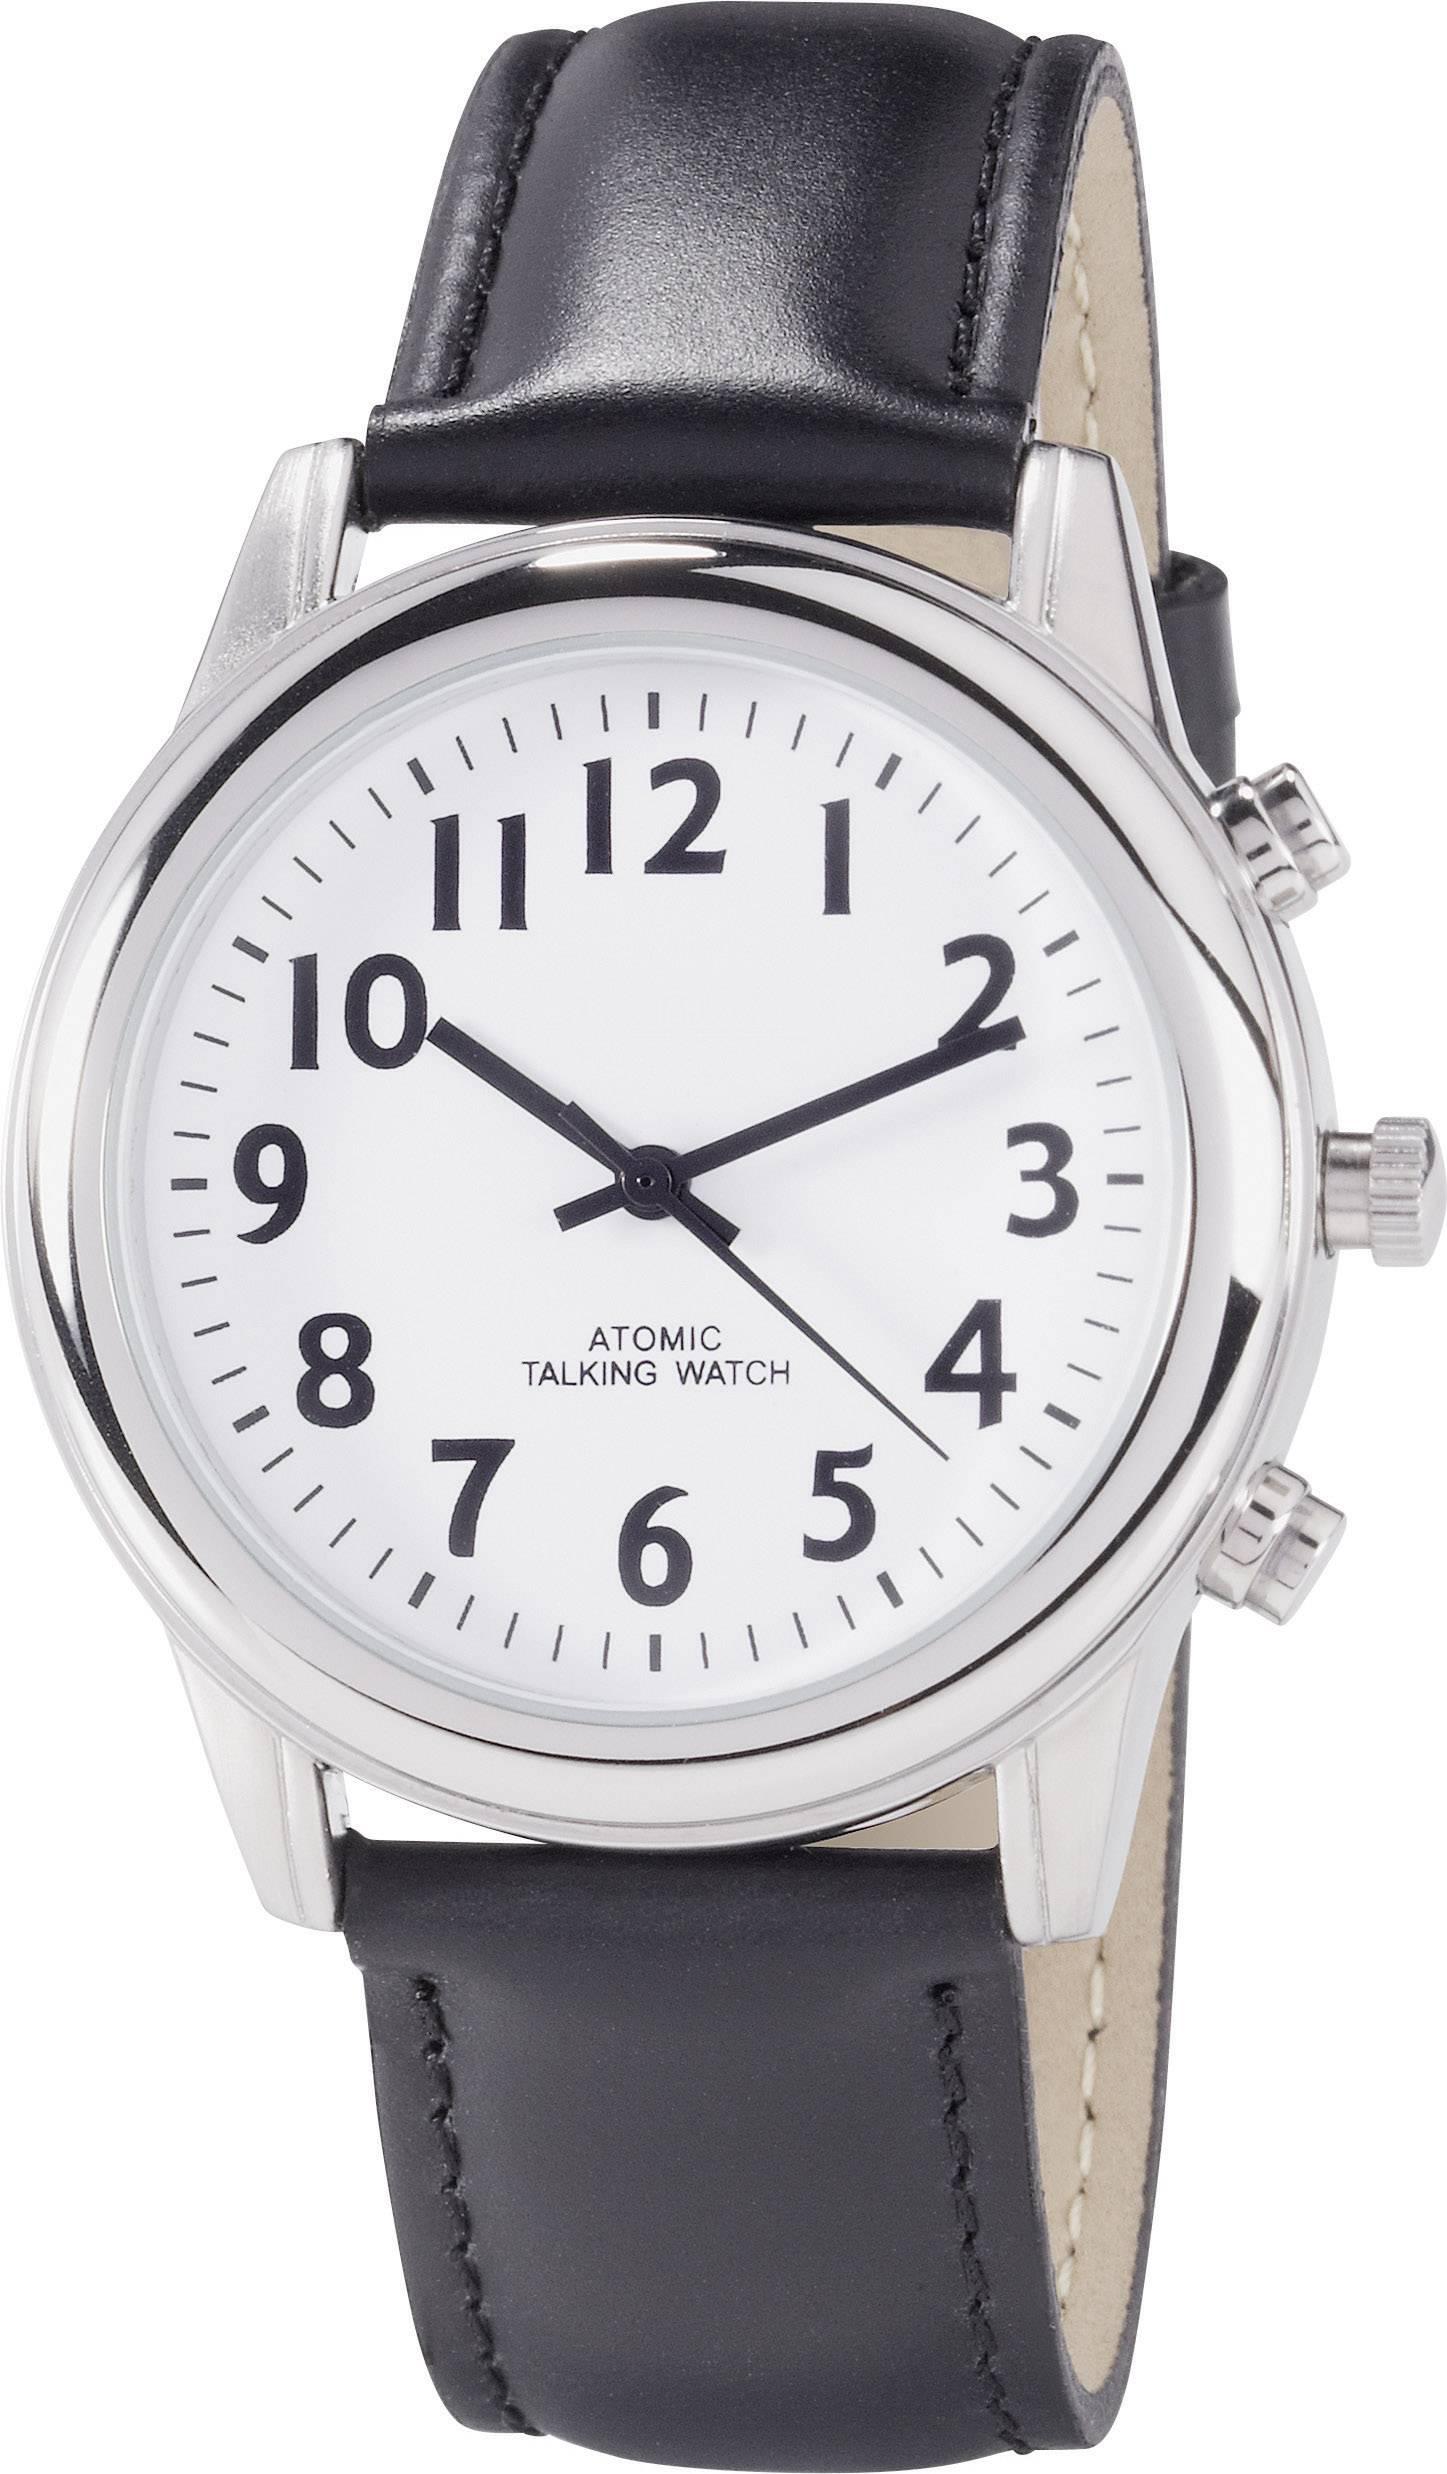 Hovoriace náramkové DCF hodinky